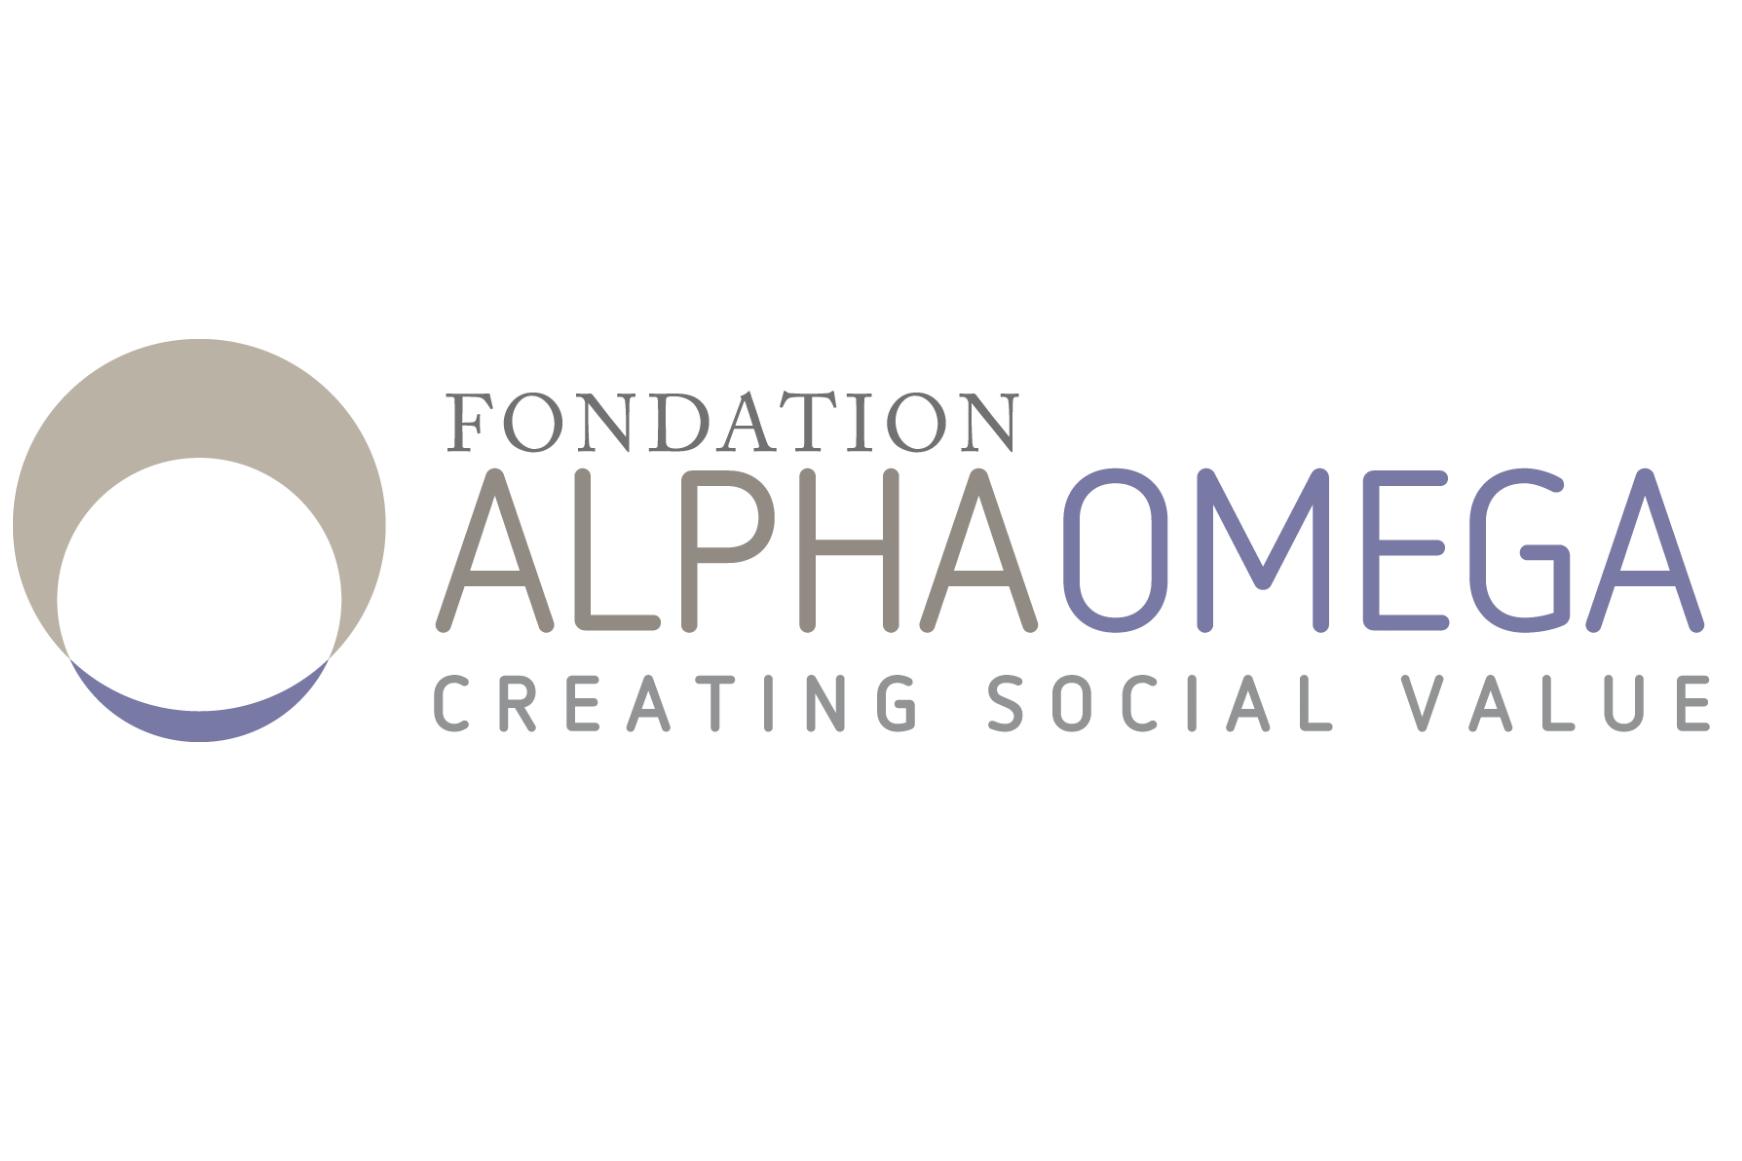 Fondation AlphaOmega